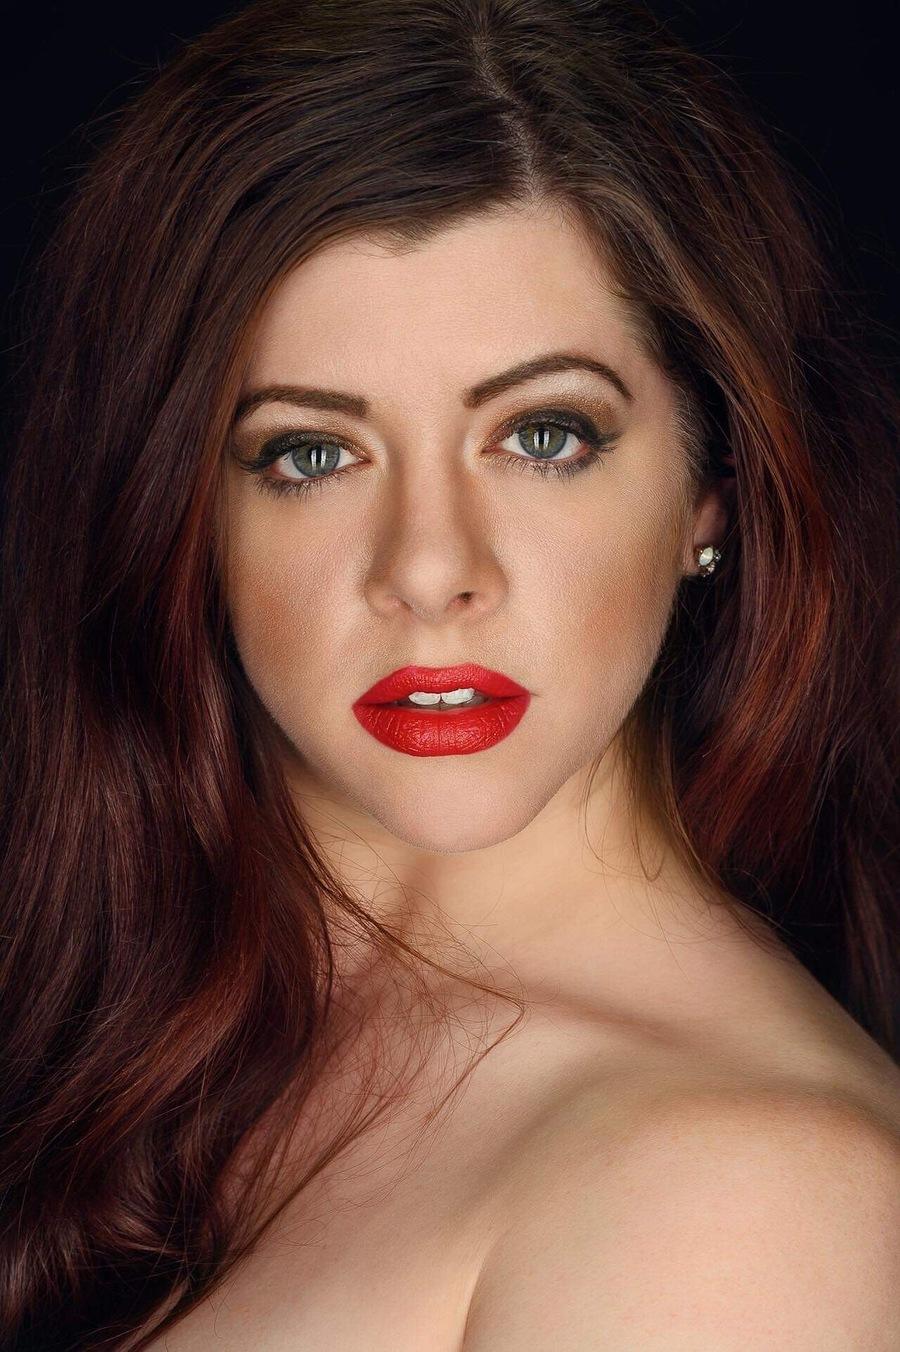 Photography by Gav Woodgate, Model Rhianna Grey, Taken at YorkPhotoStudio / Uploaded 13th November 2019 @ 10:01 PM